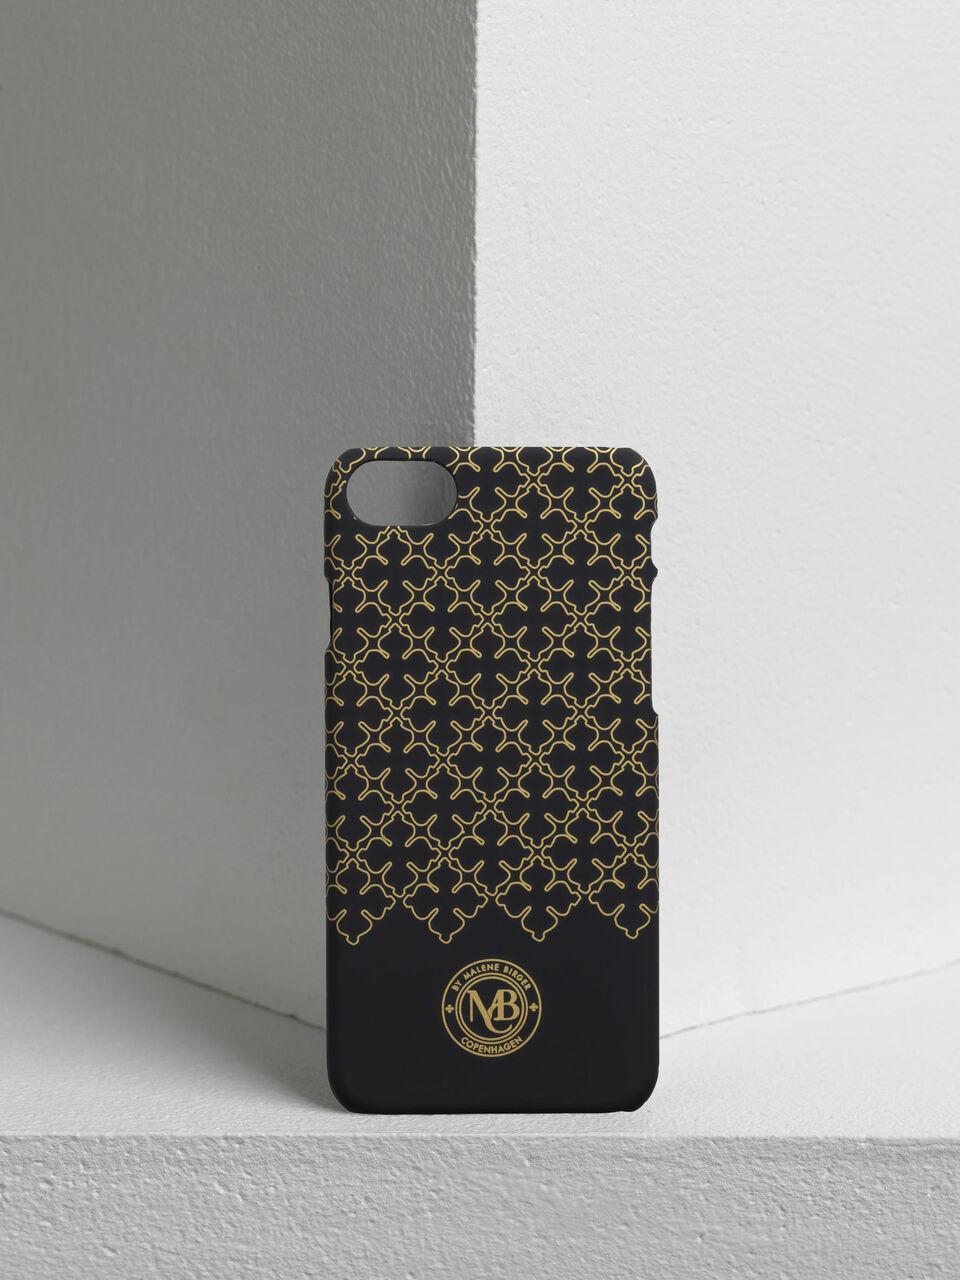 più popolare ultima vendita in vendita Pamsy iPhone 7/8 Cover - Buy iPhone covers online